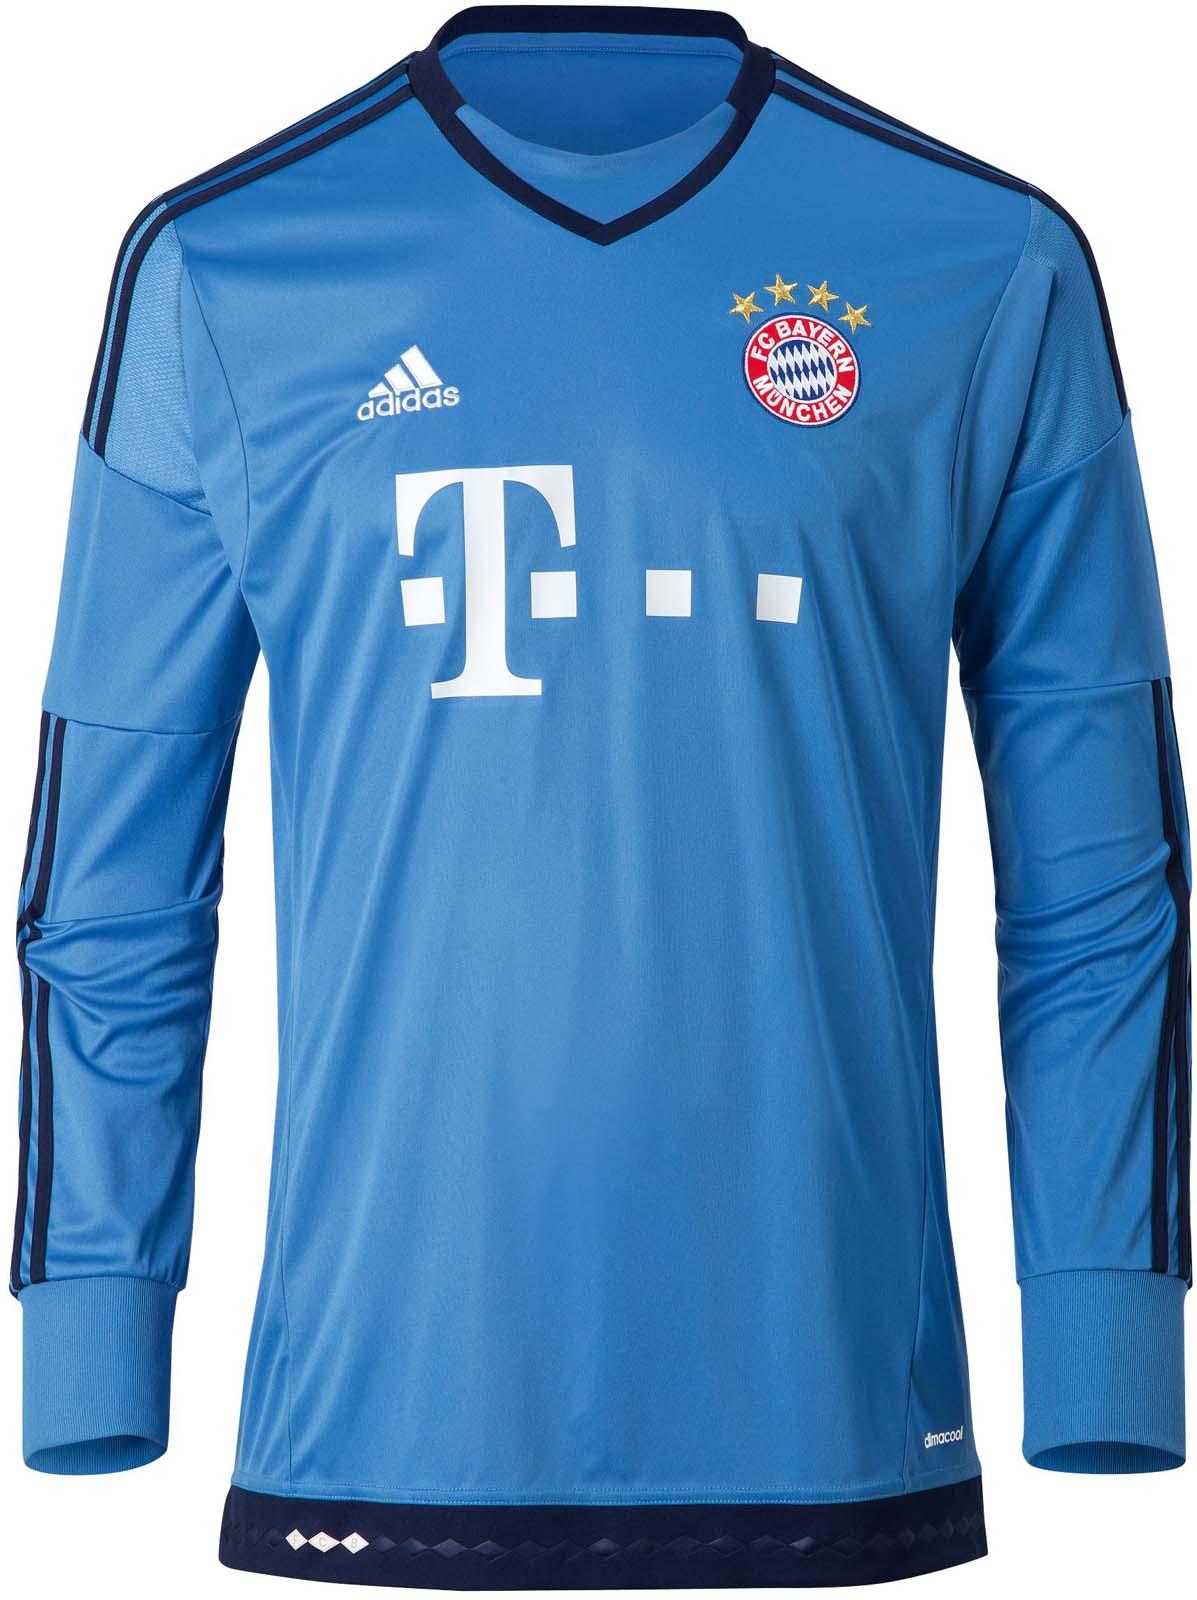 FC Bayern München 15-16 Kits Released